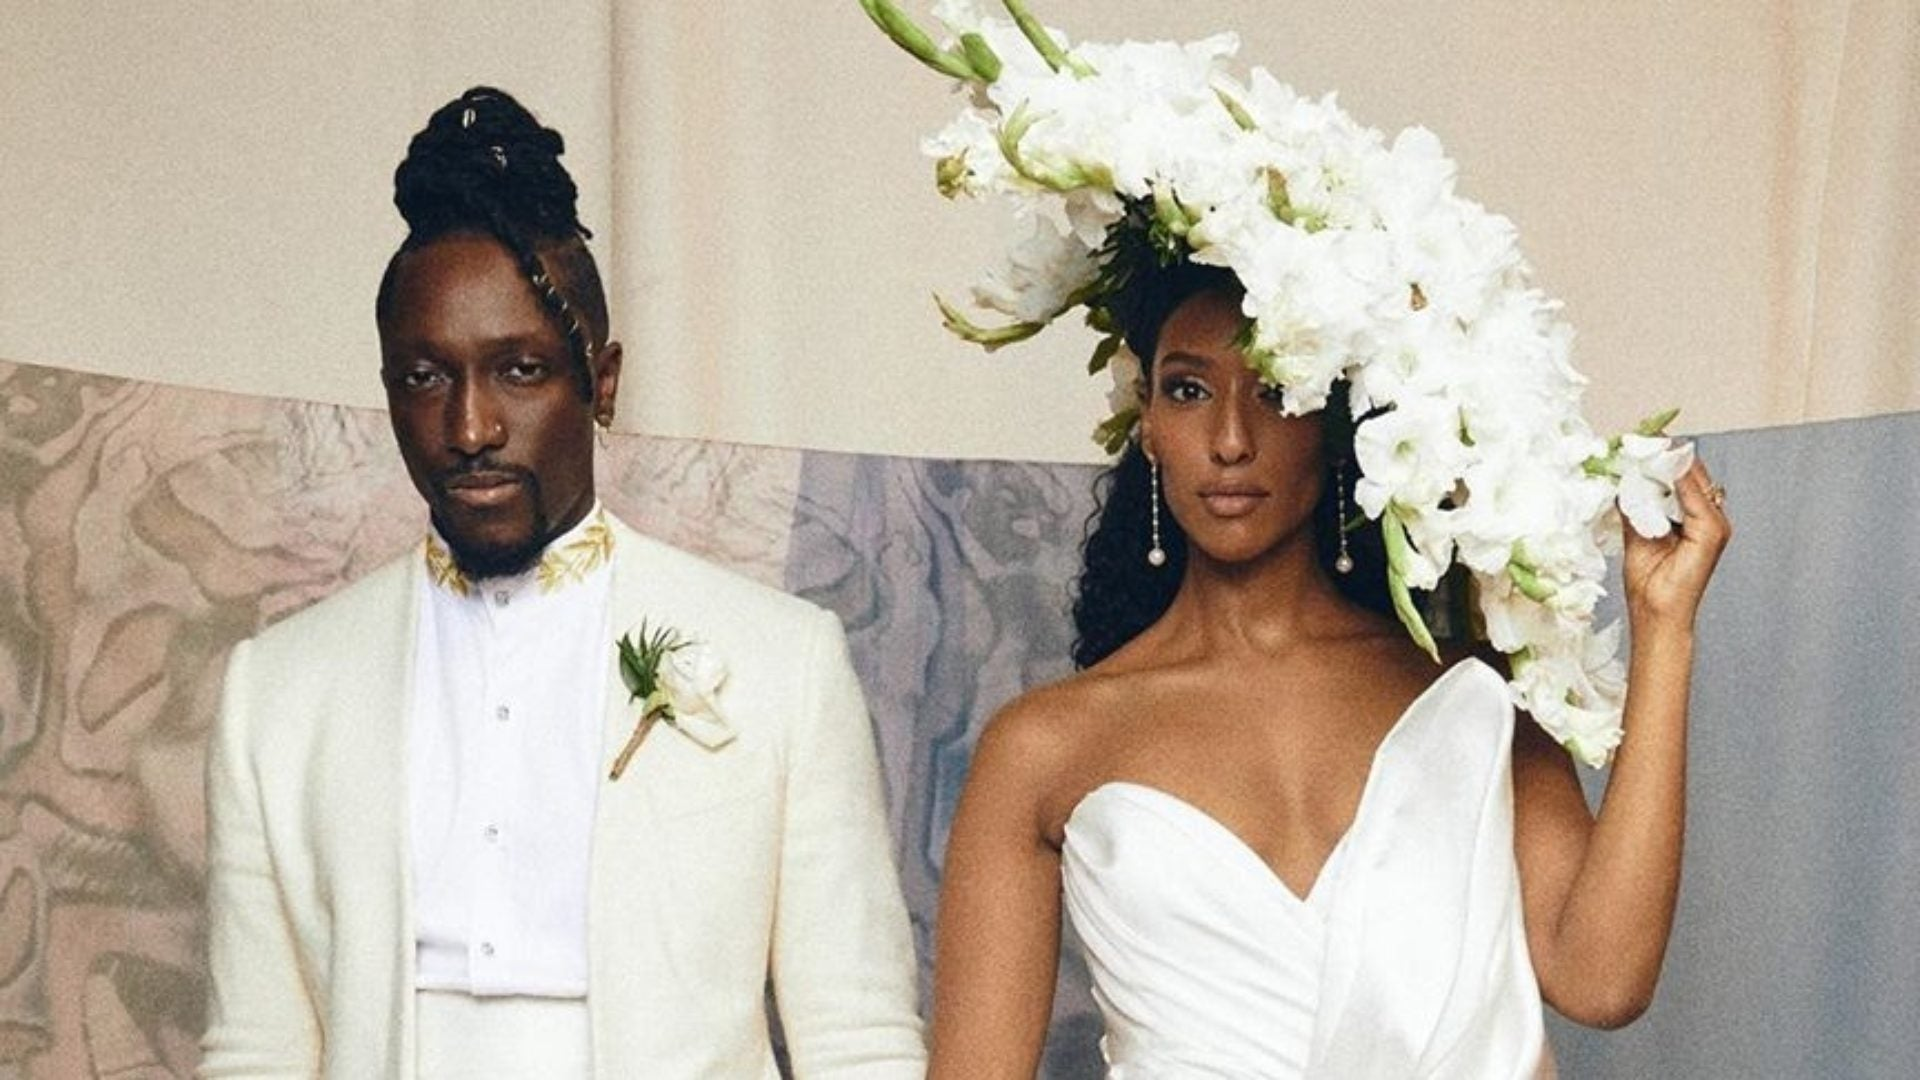 The Best Dressed Black Brides This Wedding Season